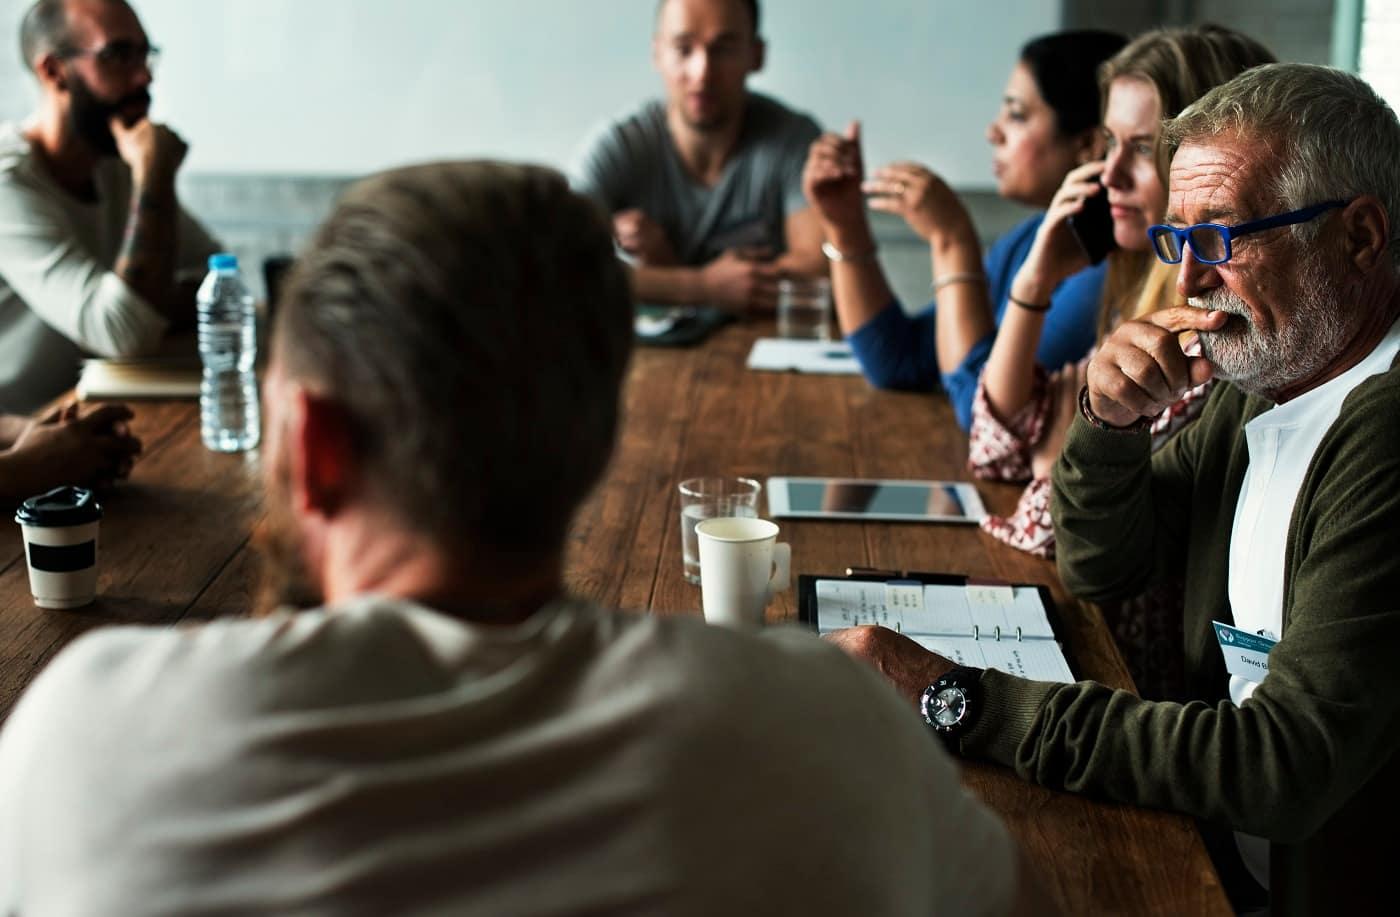 Reunión de trabajadores Protección datos para sindicatos